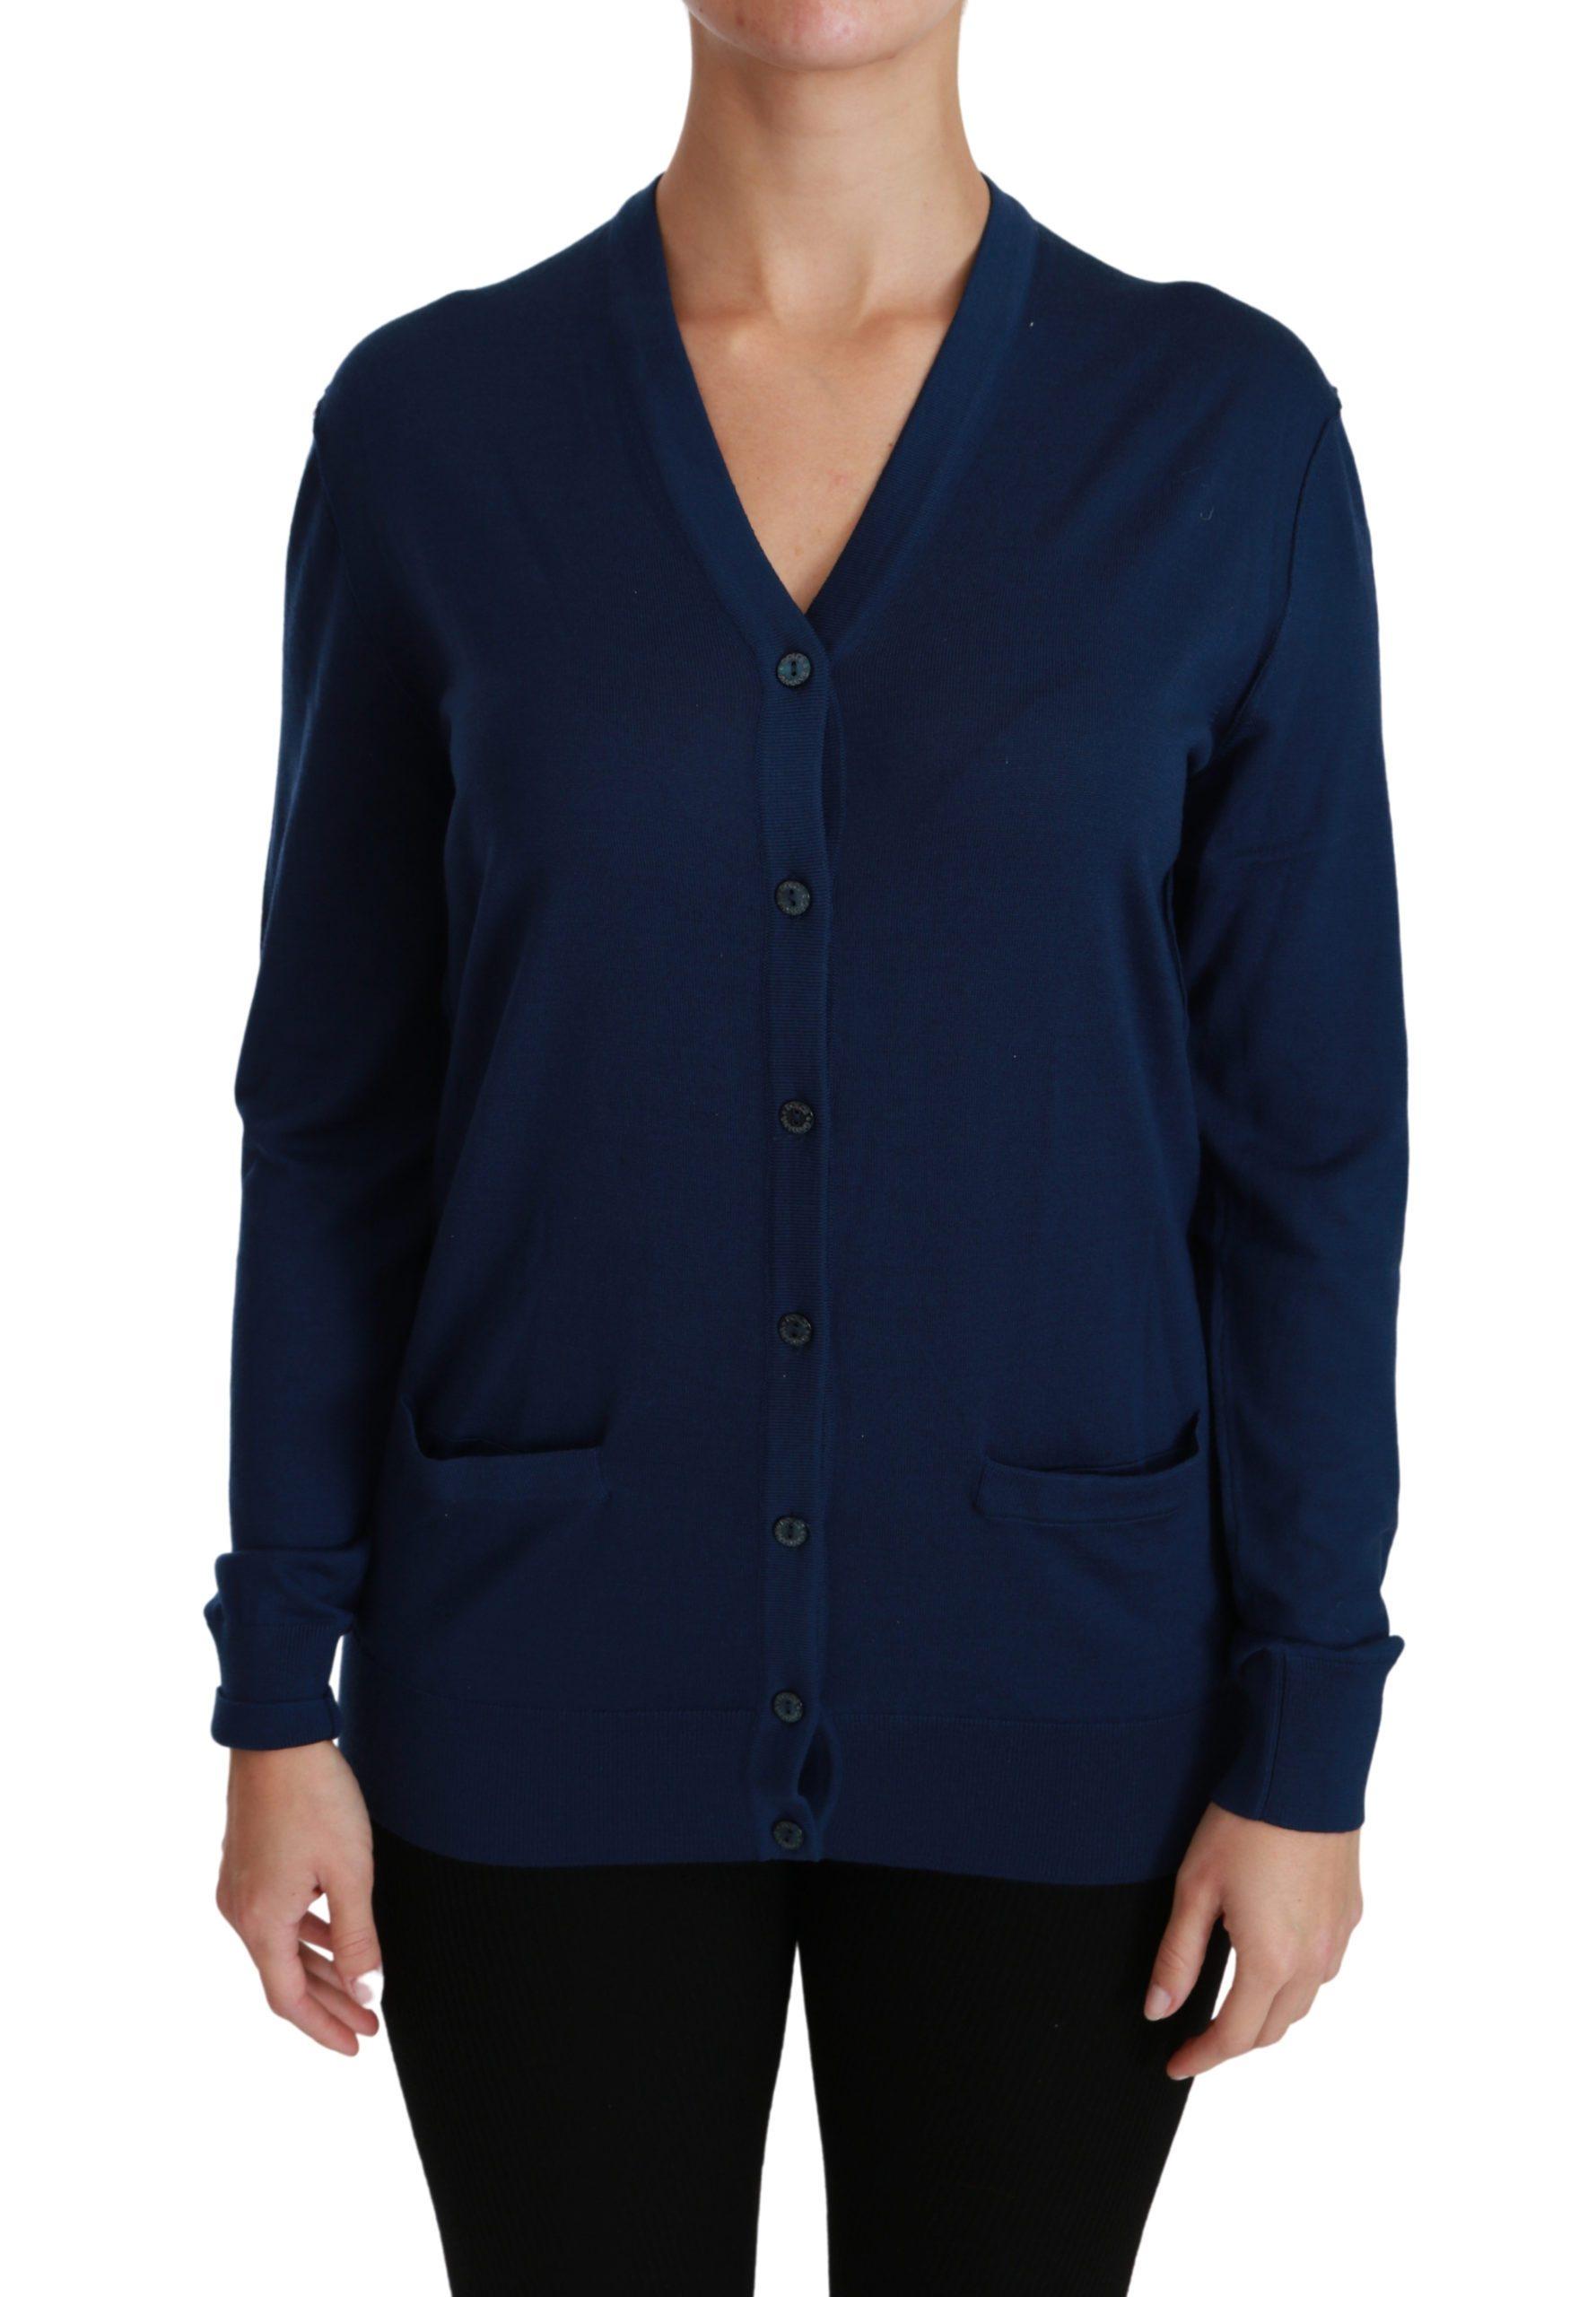 Dolce & Gabbana Women's Button Virgin Wool Cardigan Blue TSH4441 - IT36   XS